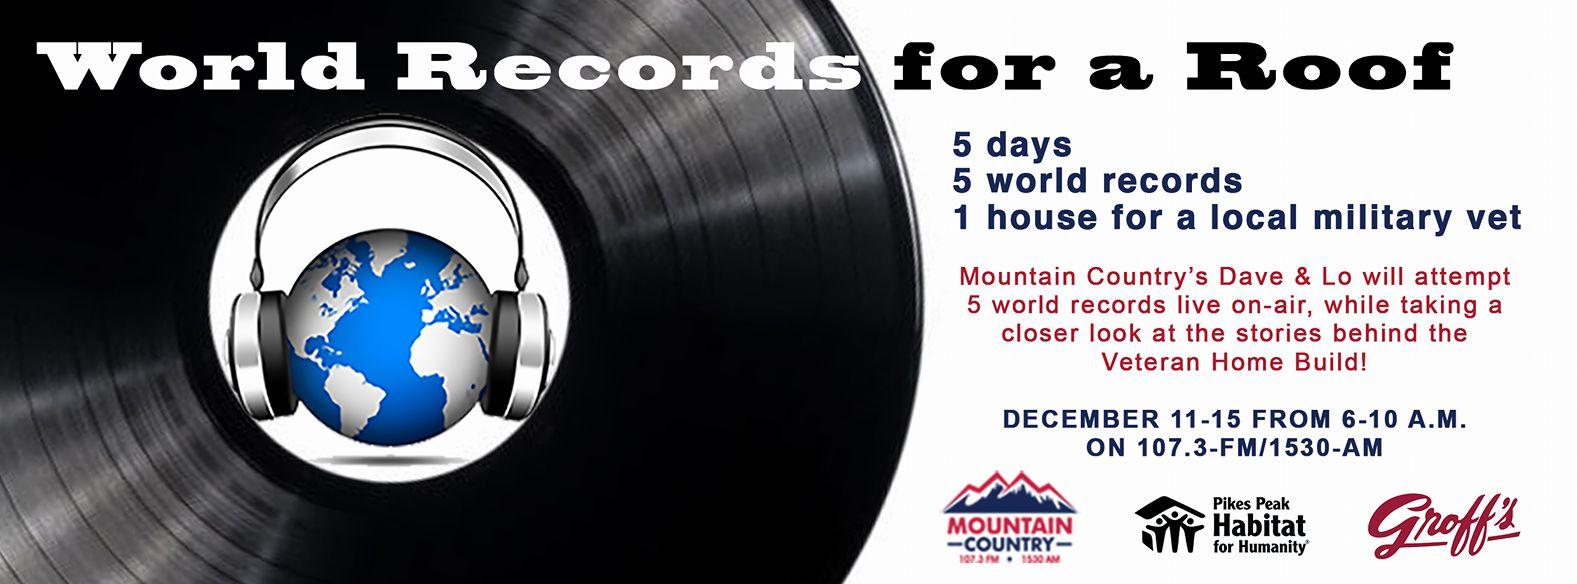 world record pic